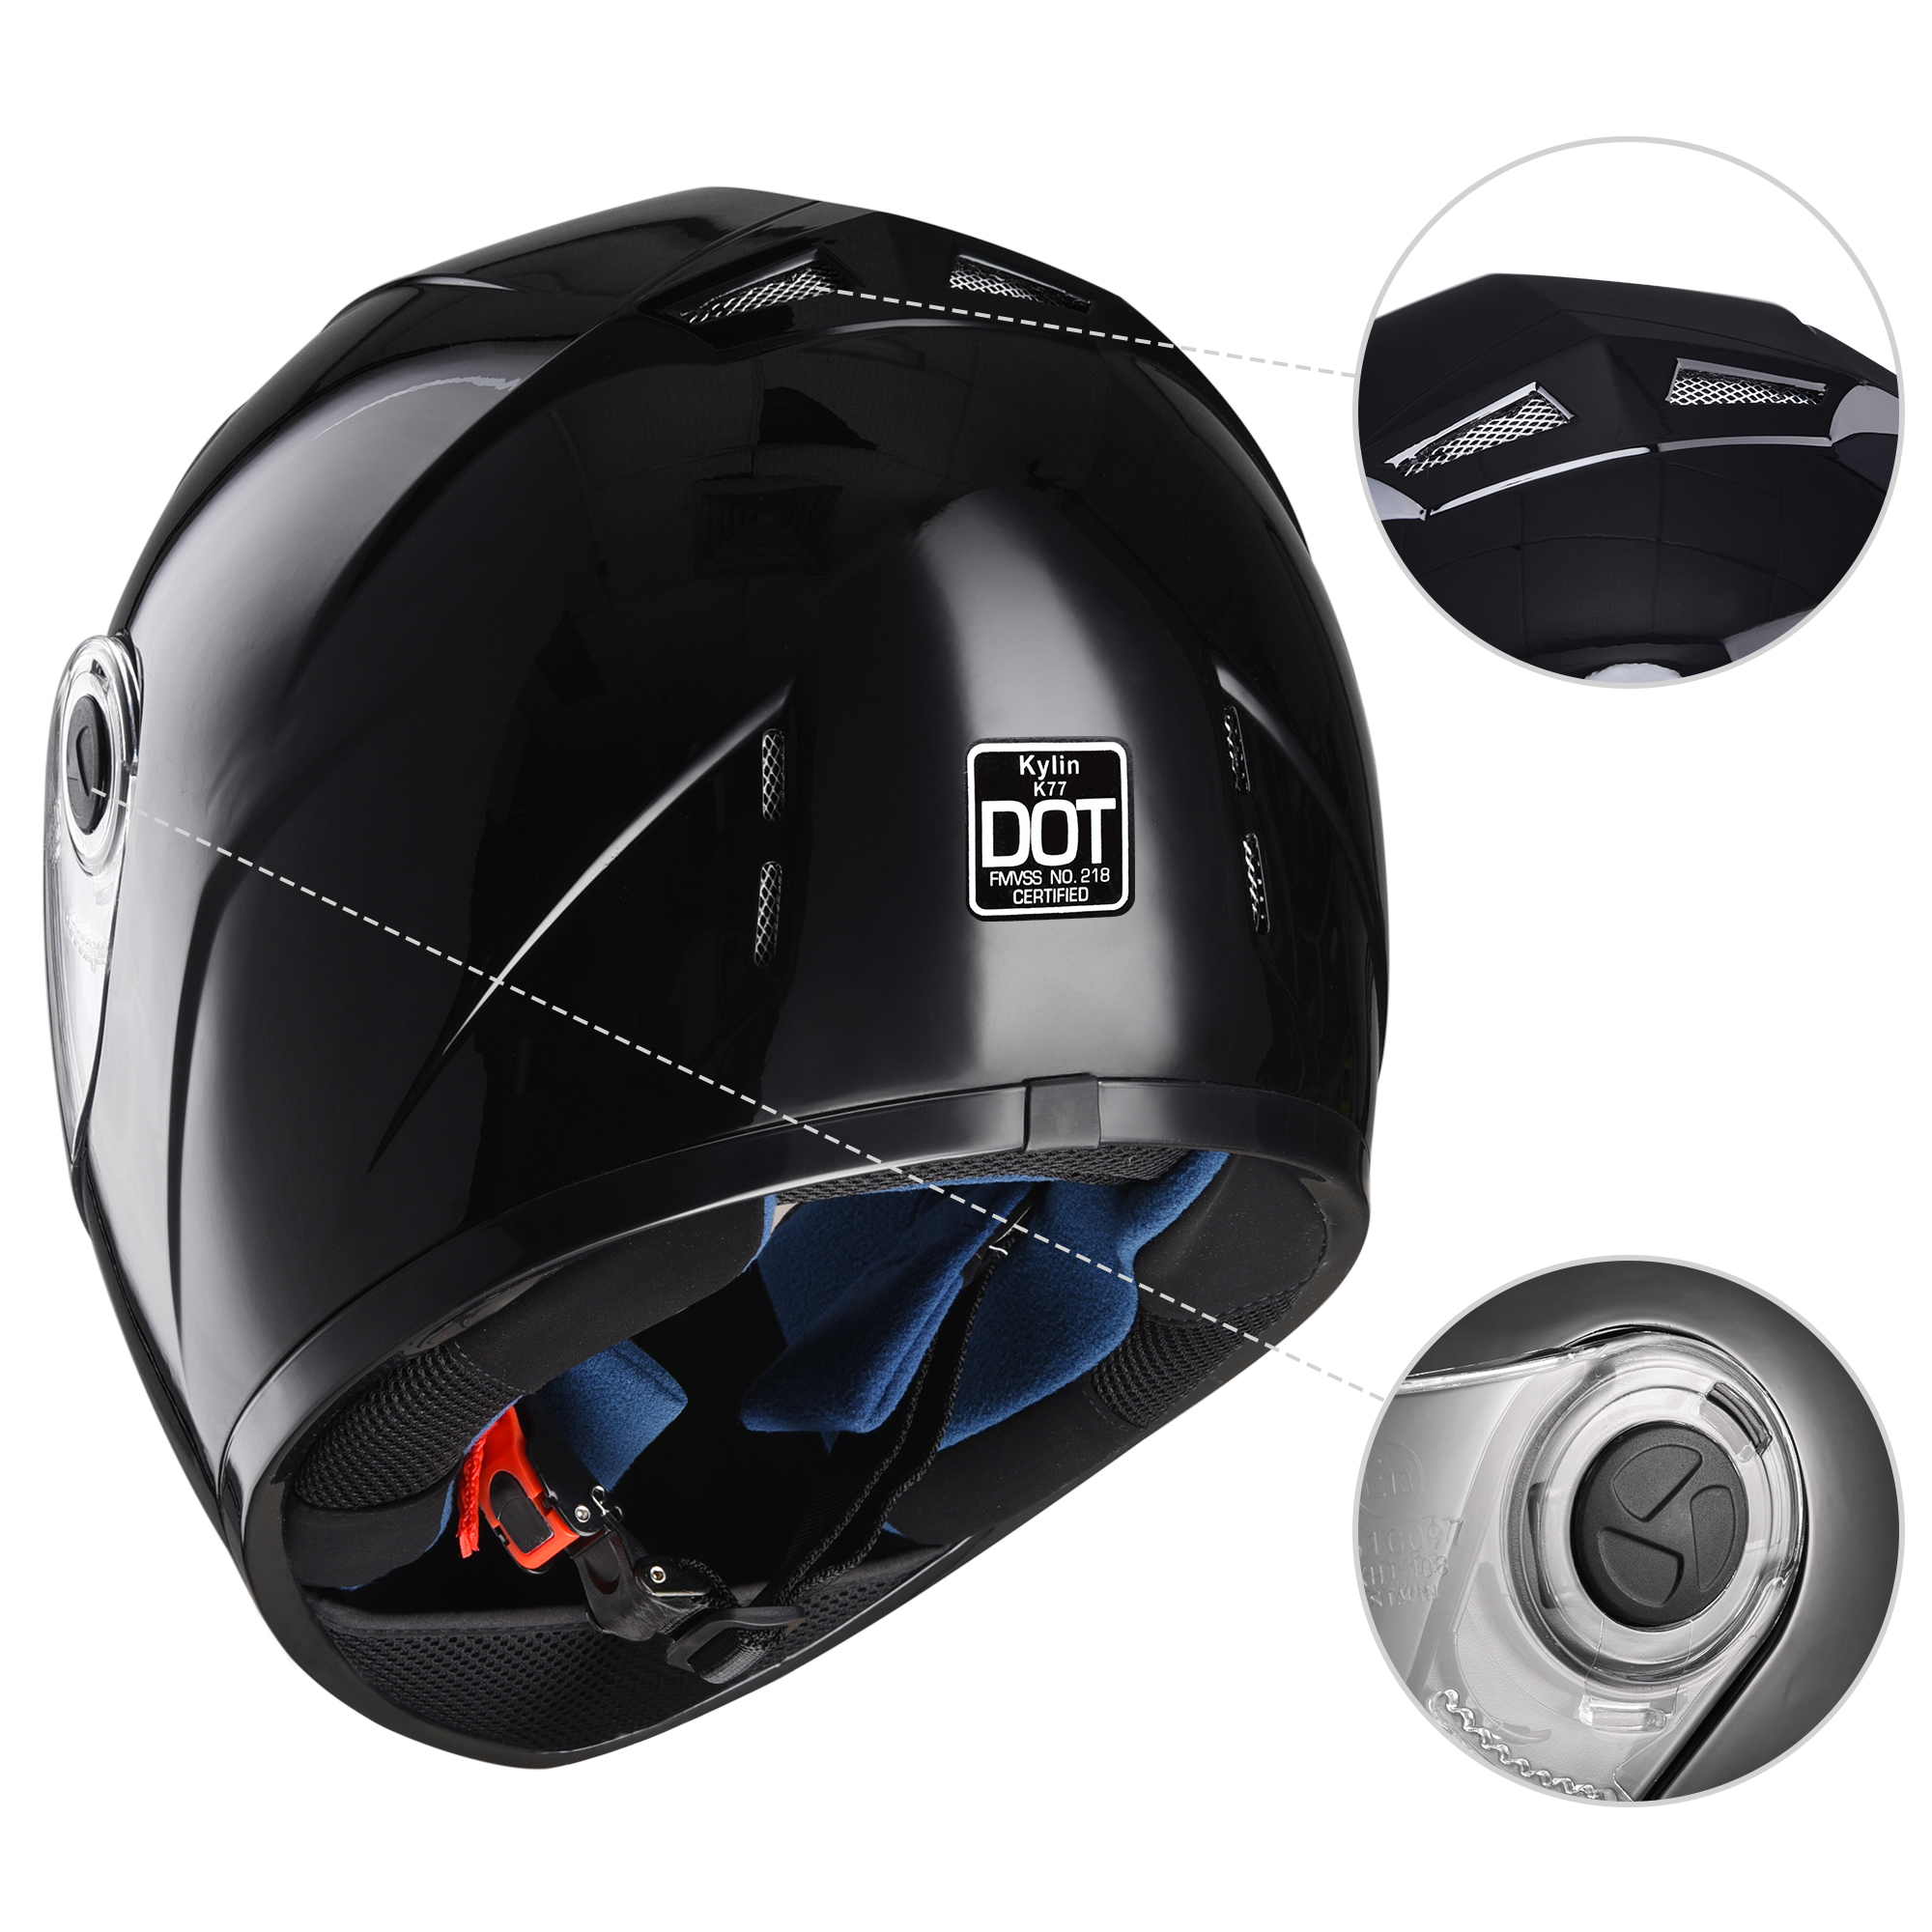 miniature 17 - AHR K12 Full Face Motorcycle Helmet DOT Air Vents Clear Visor Racing S M L XL